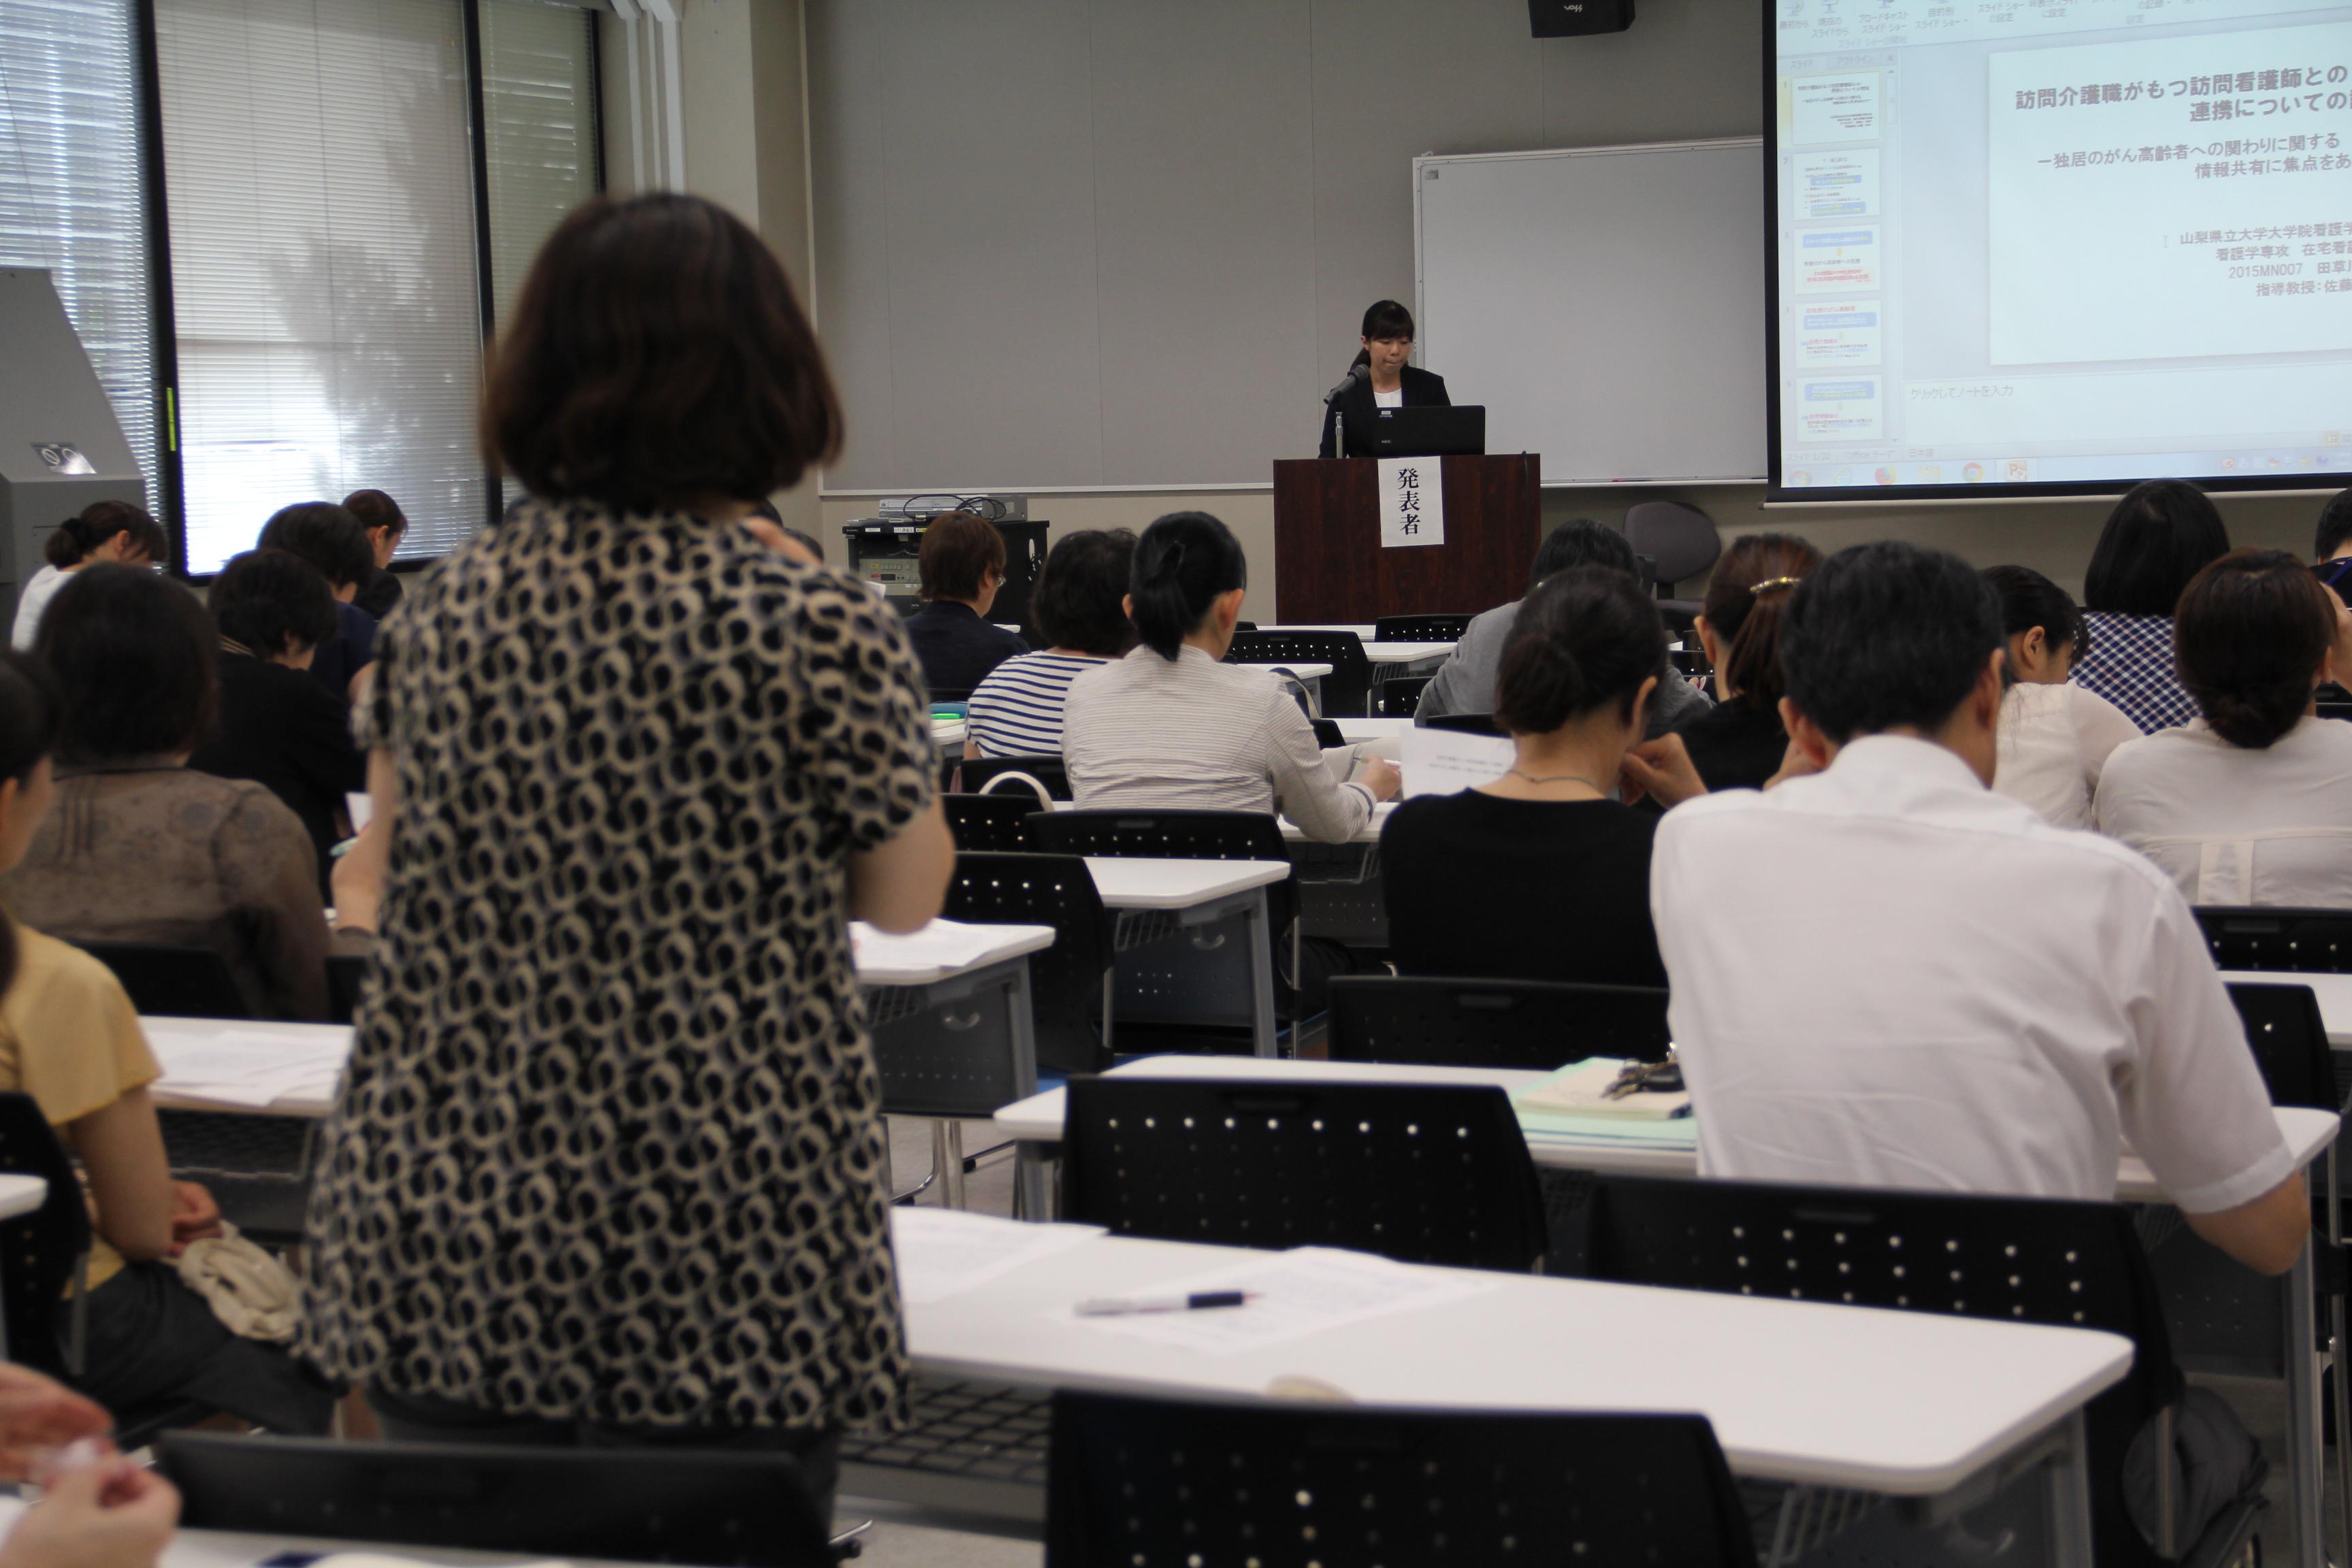 http://graduatenursing-yamanashiken.com/IMG_2745.JPG